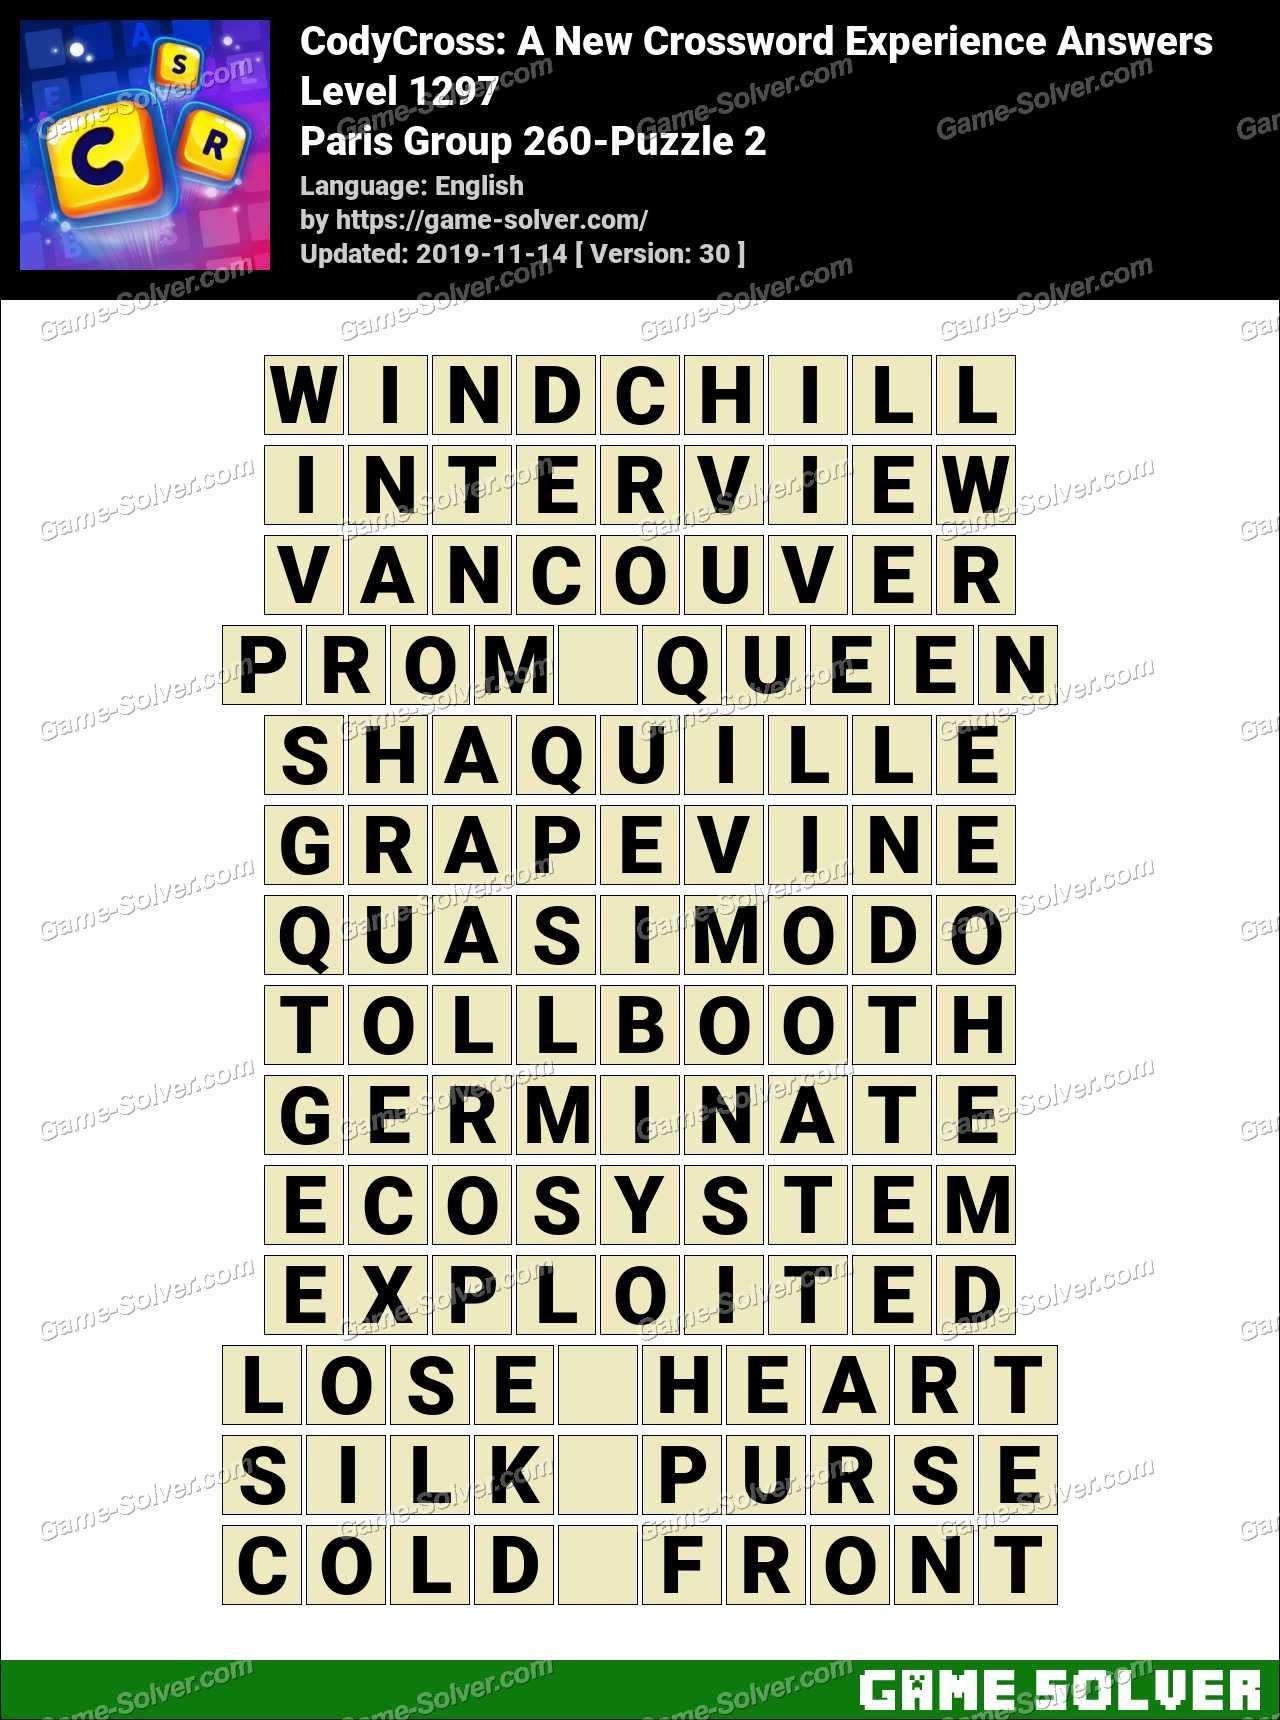 CodyCross Paris Group 260-Puzzle 2 Answers